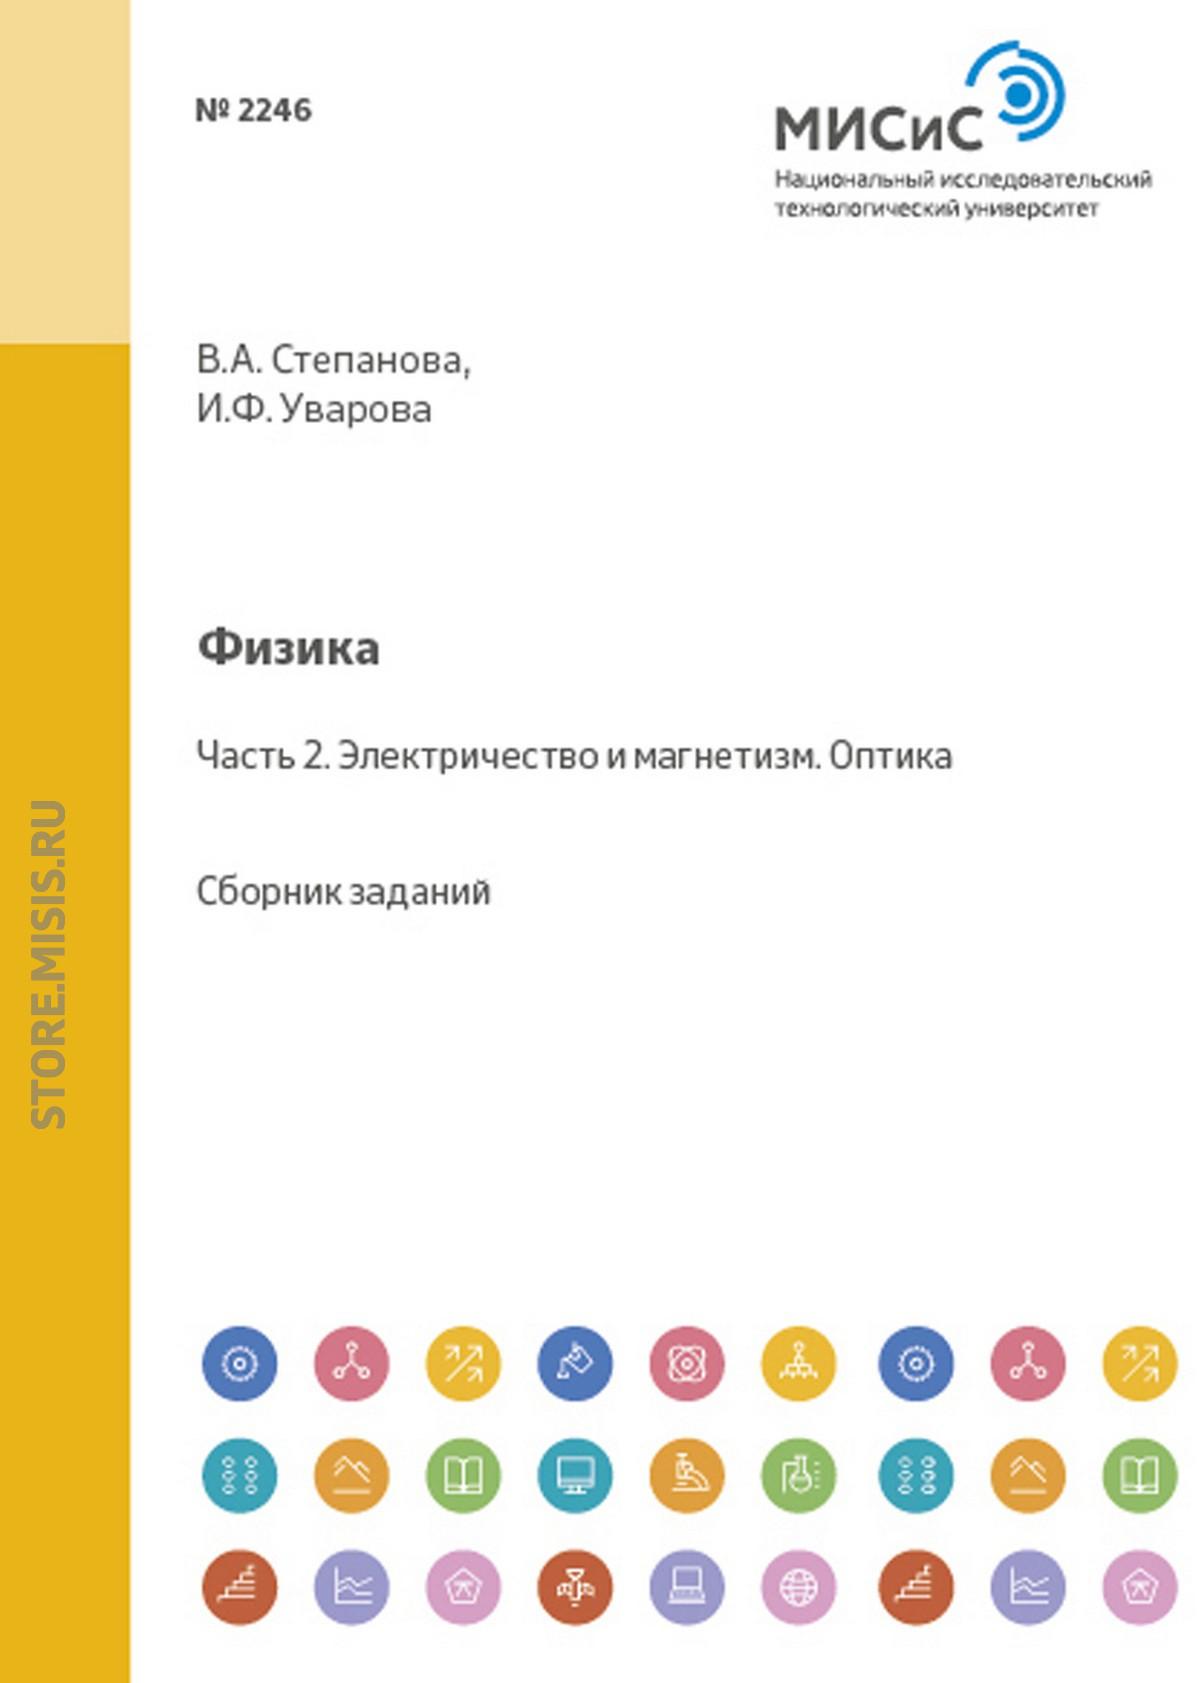 Ирина Уварова Физика. Часть 2. Электричество и магнетизм. Оптика